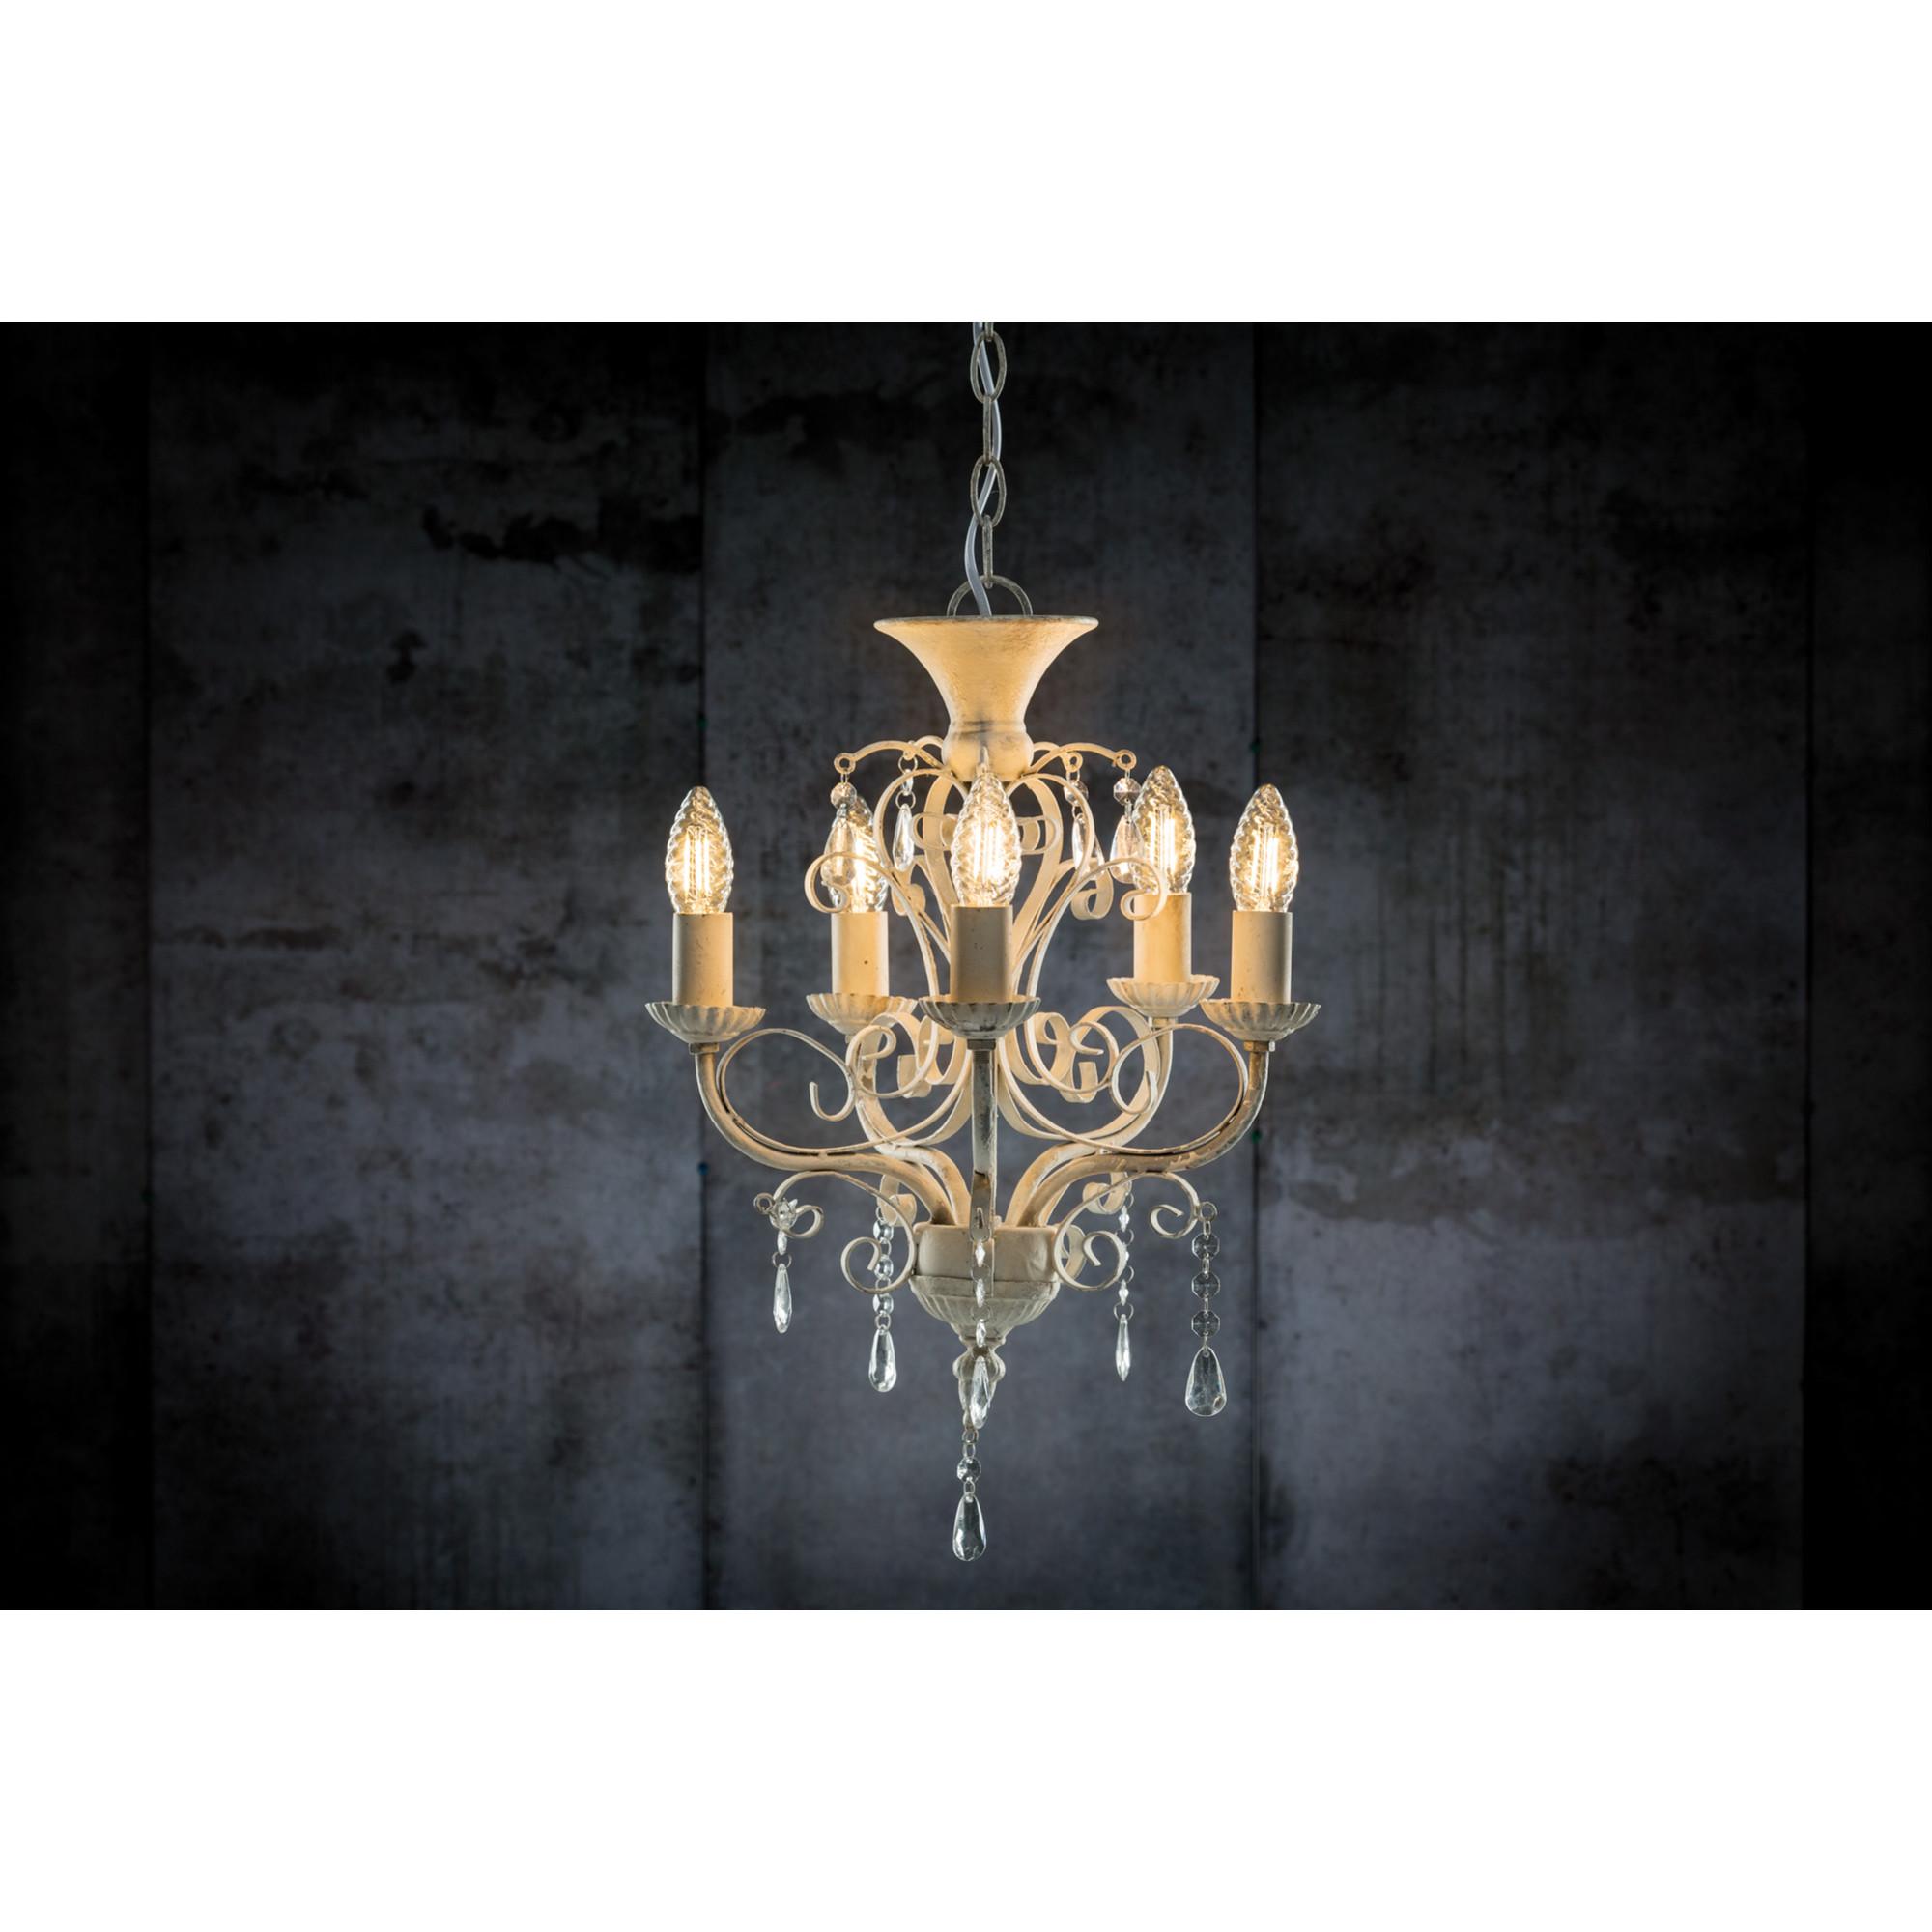 Лампа филаментная Paulmann Свеча витая 2.5Вт 250лм 2700К E14 230В Прозрачный 28371.